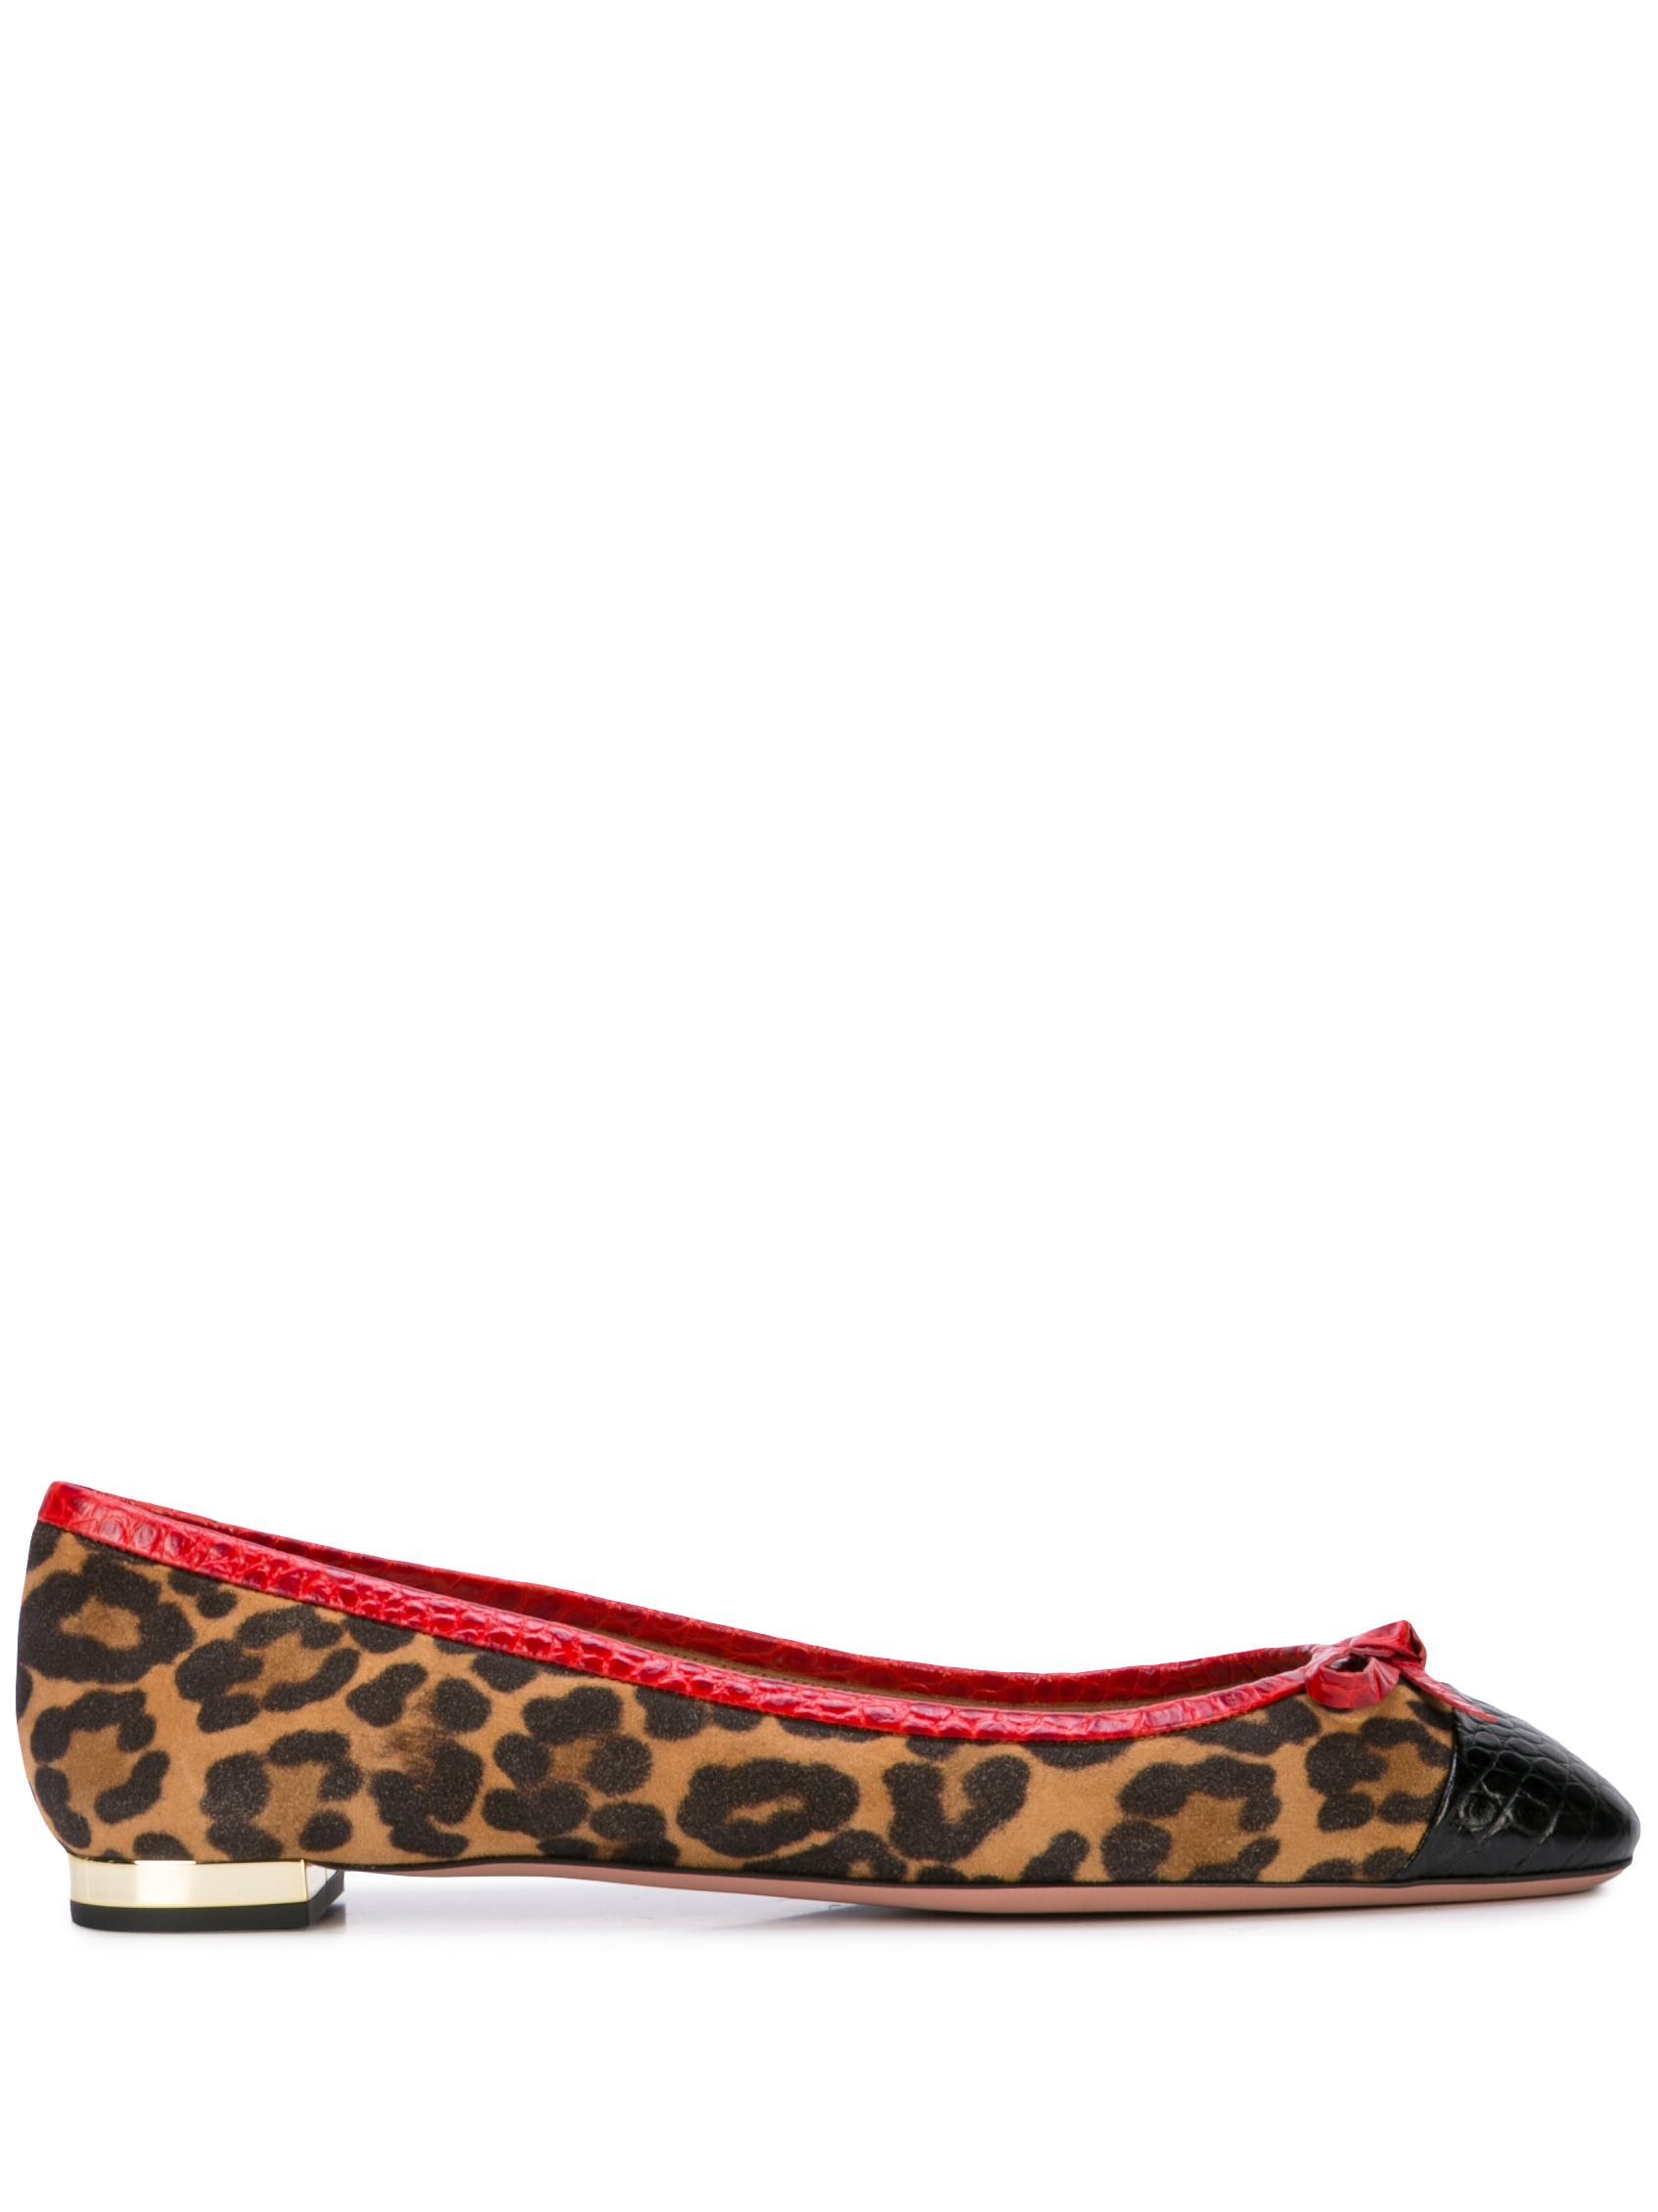 Moss Jaguar Suede/Print Crocodile Ballet Flat